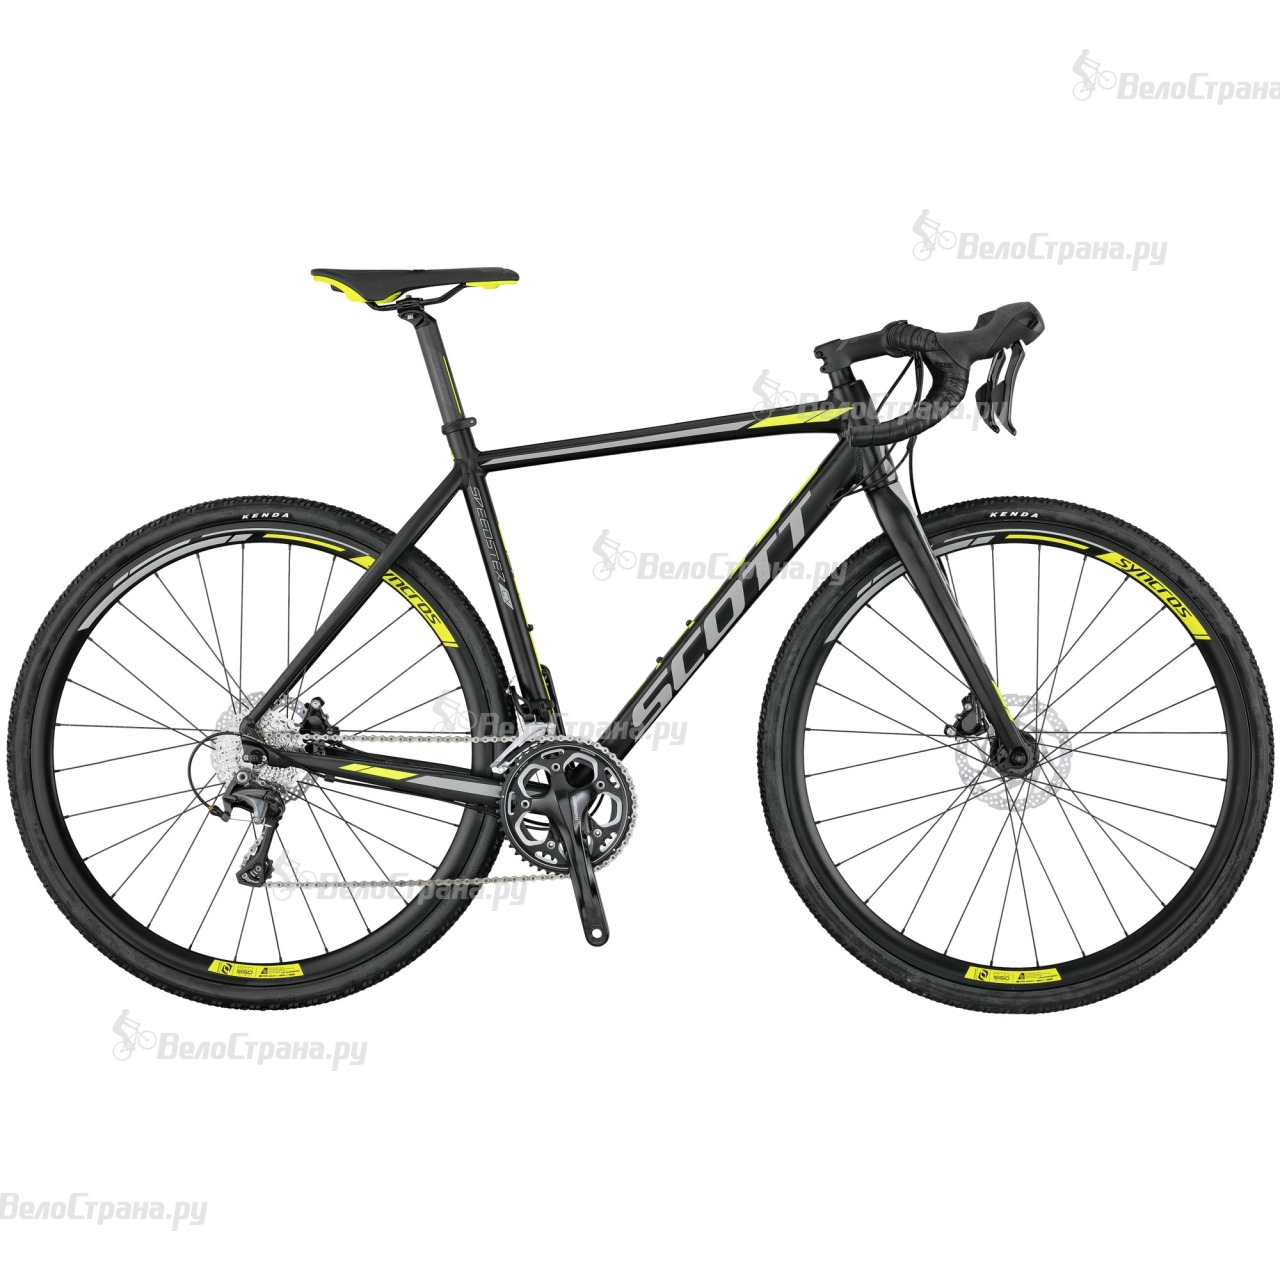 Велосипед Scott Speedster CX 10 Disc (2017)